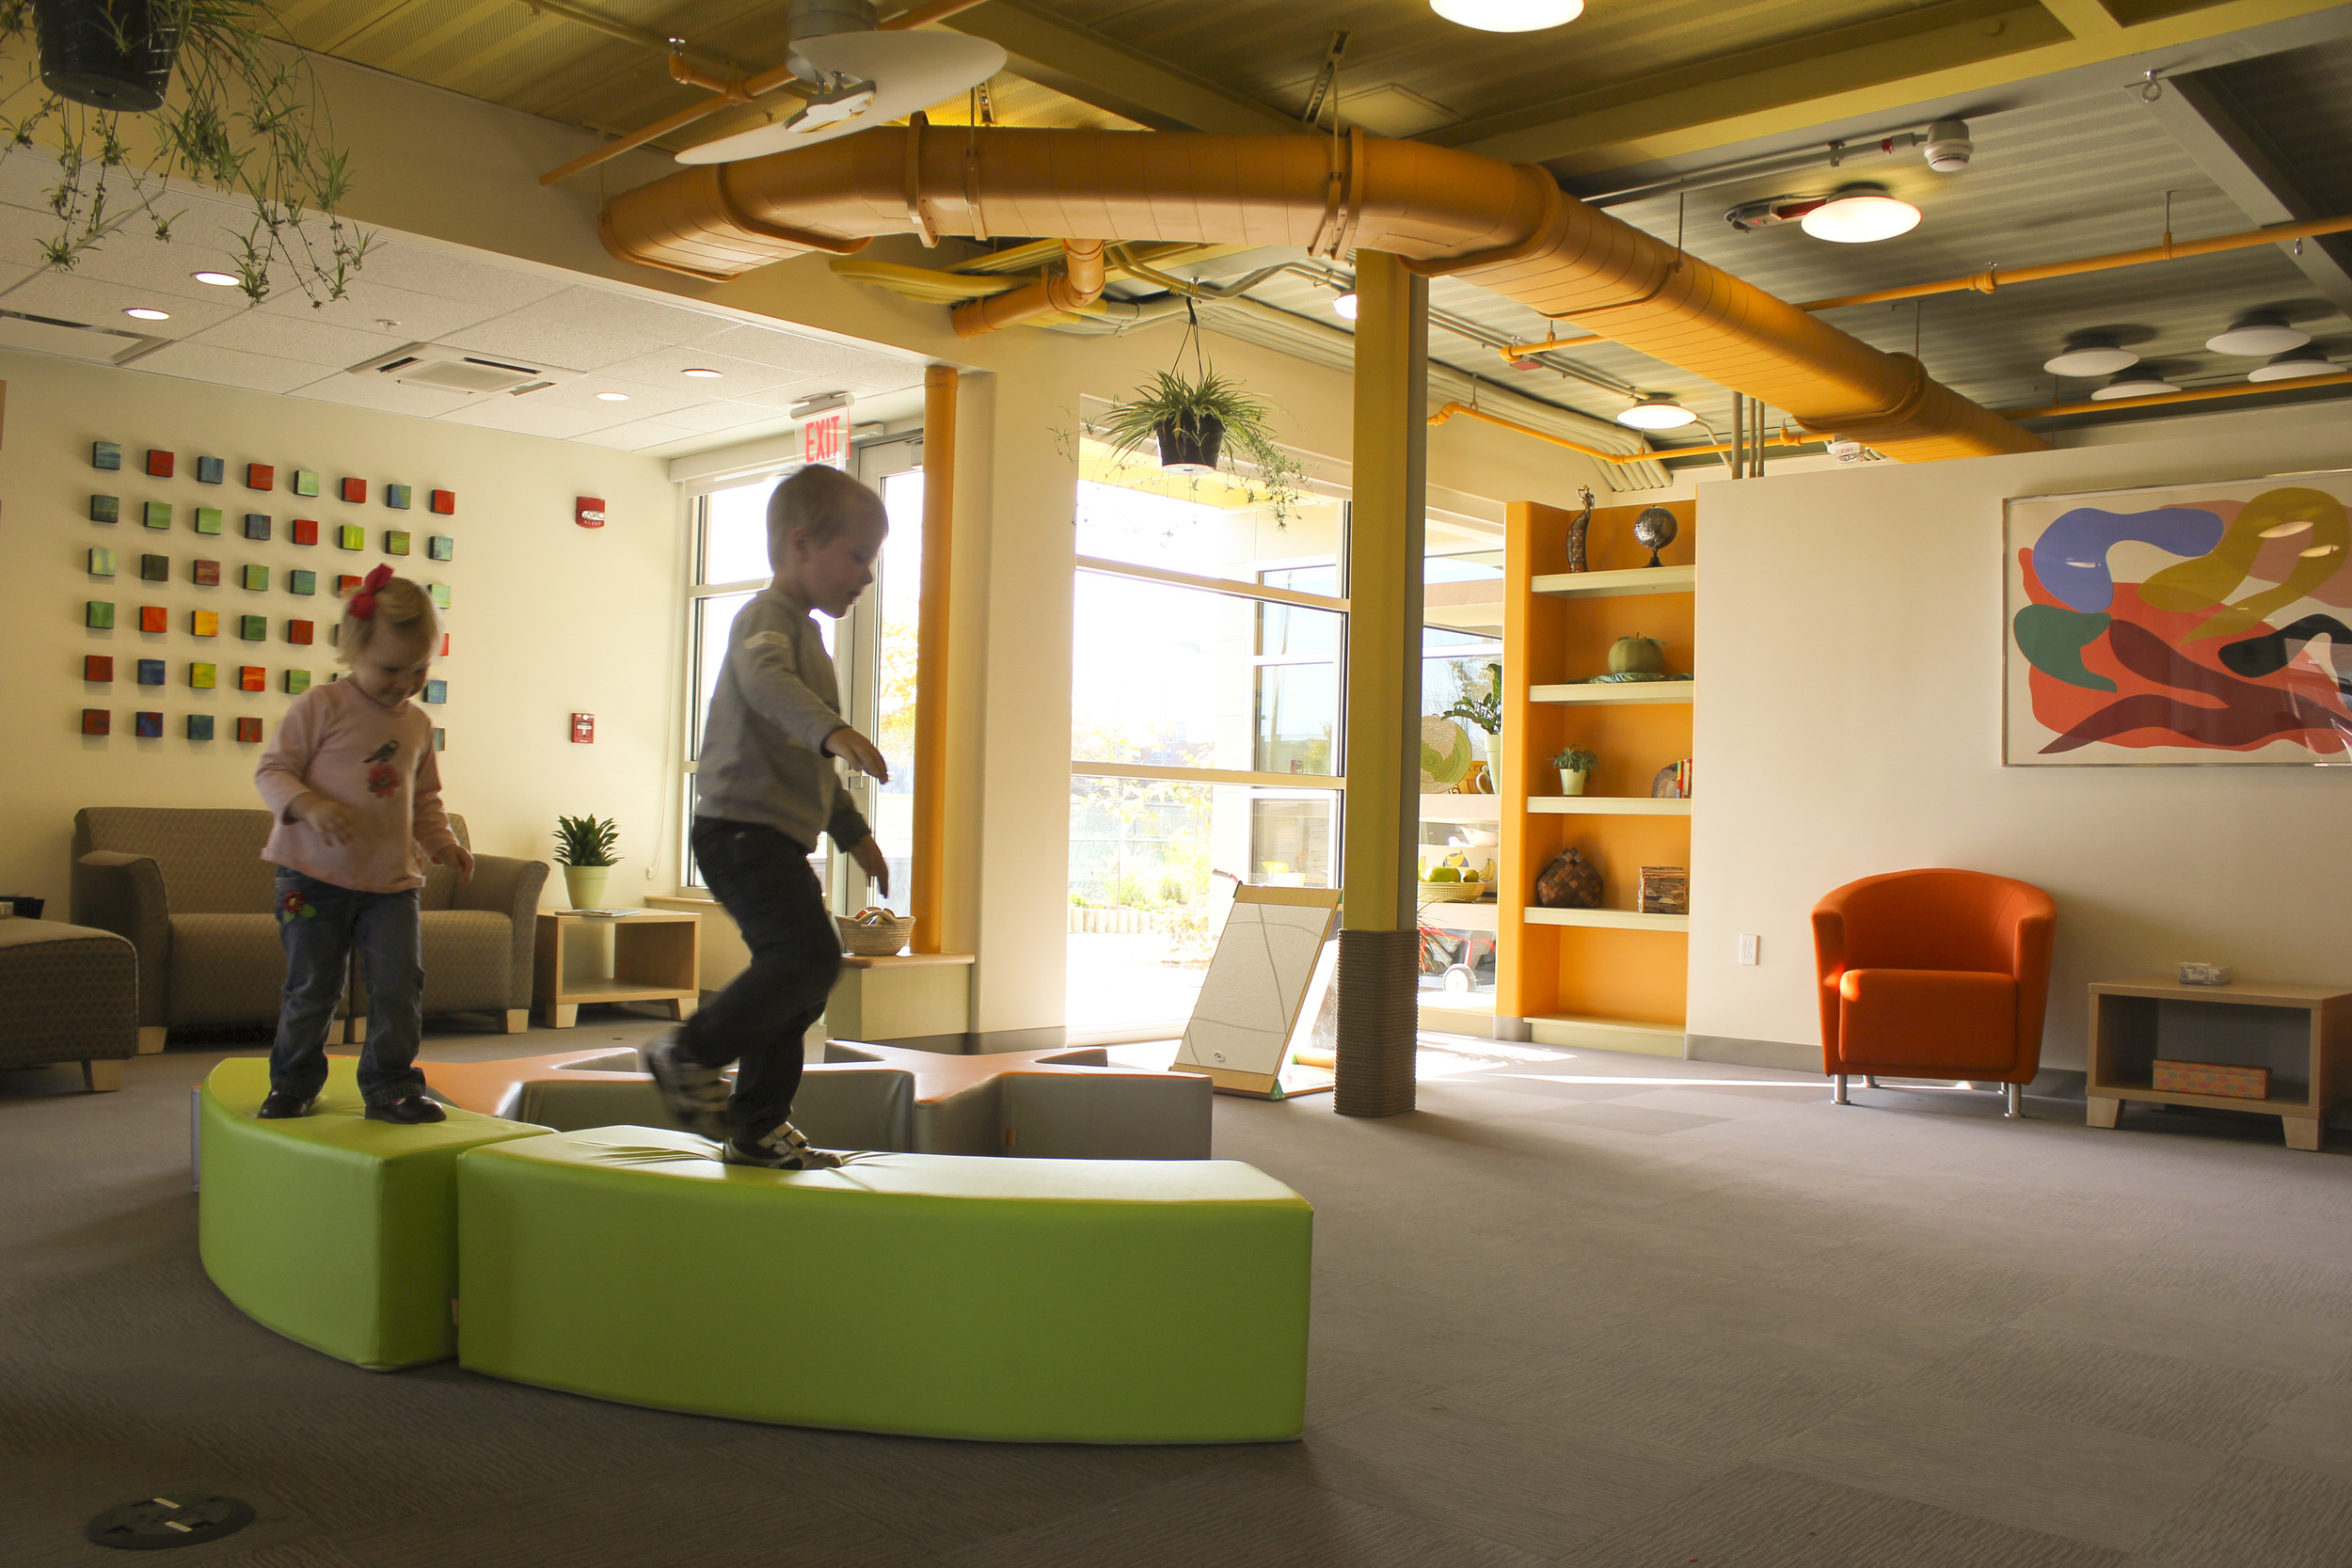 pho-int-lobby furniture play-warmer-72ppi-72x48.JPG